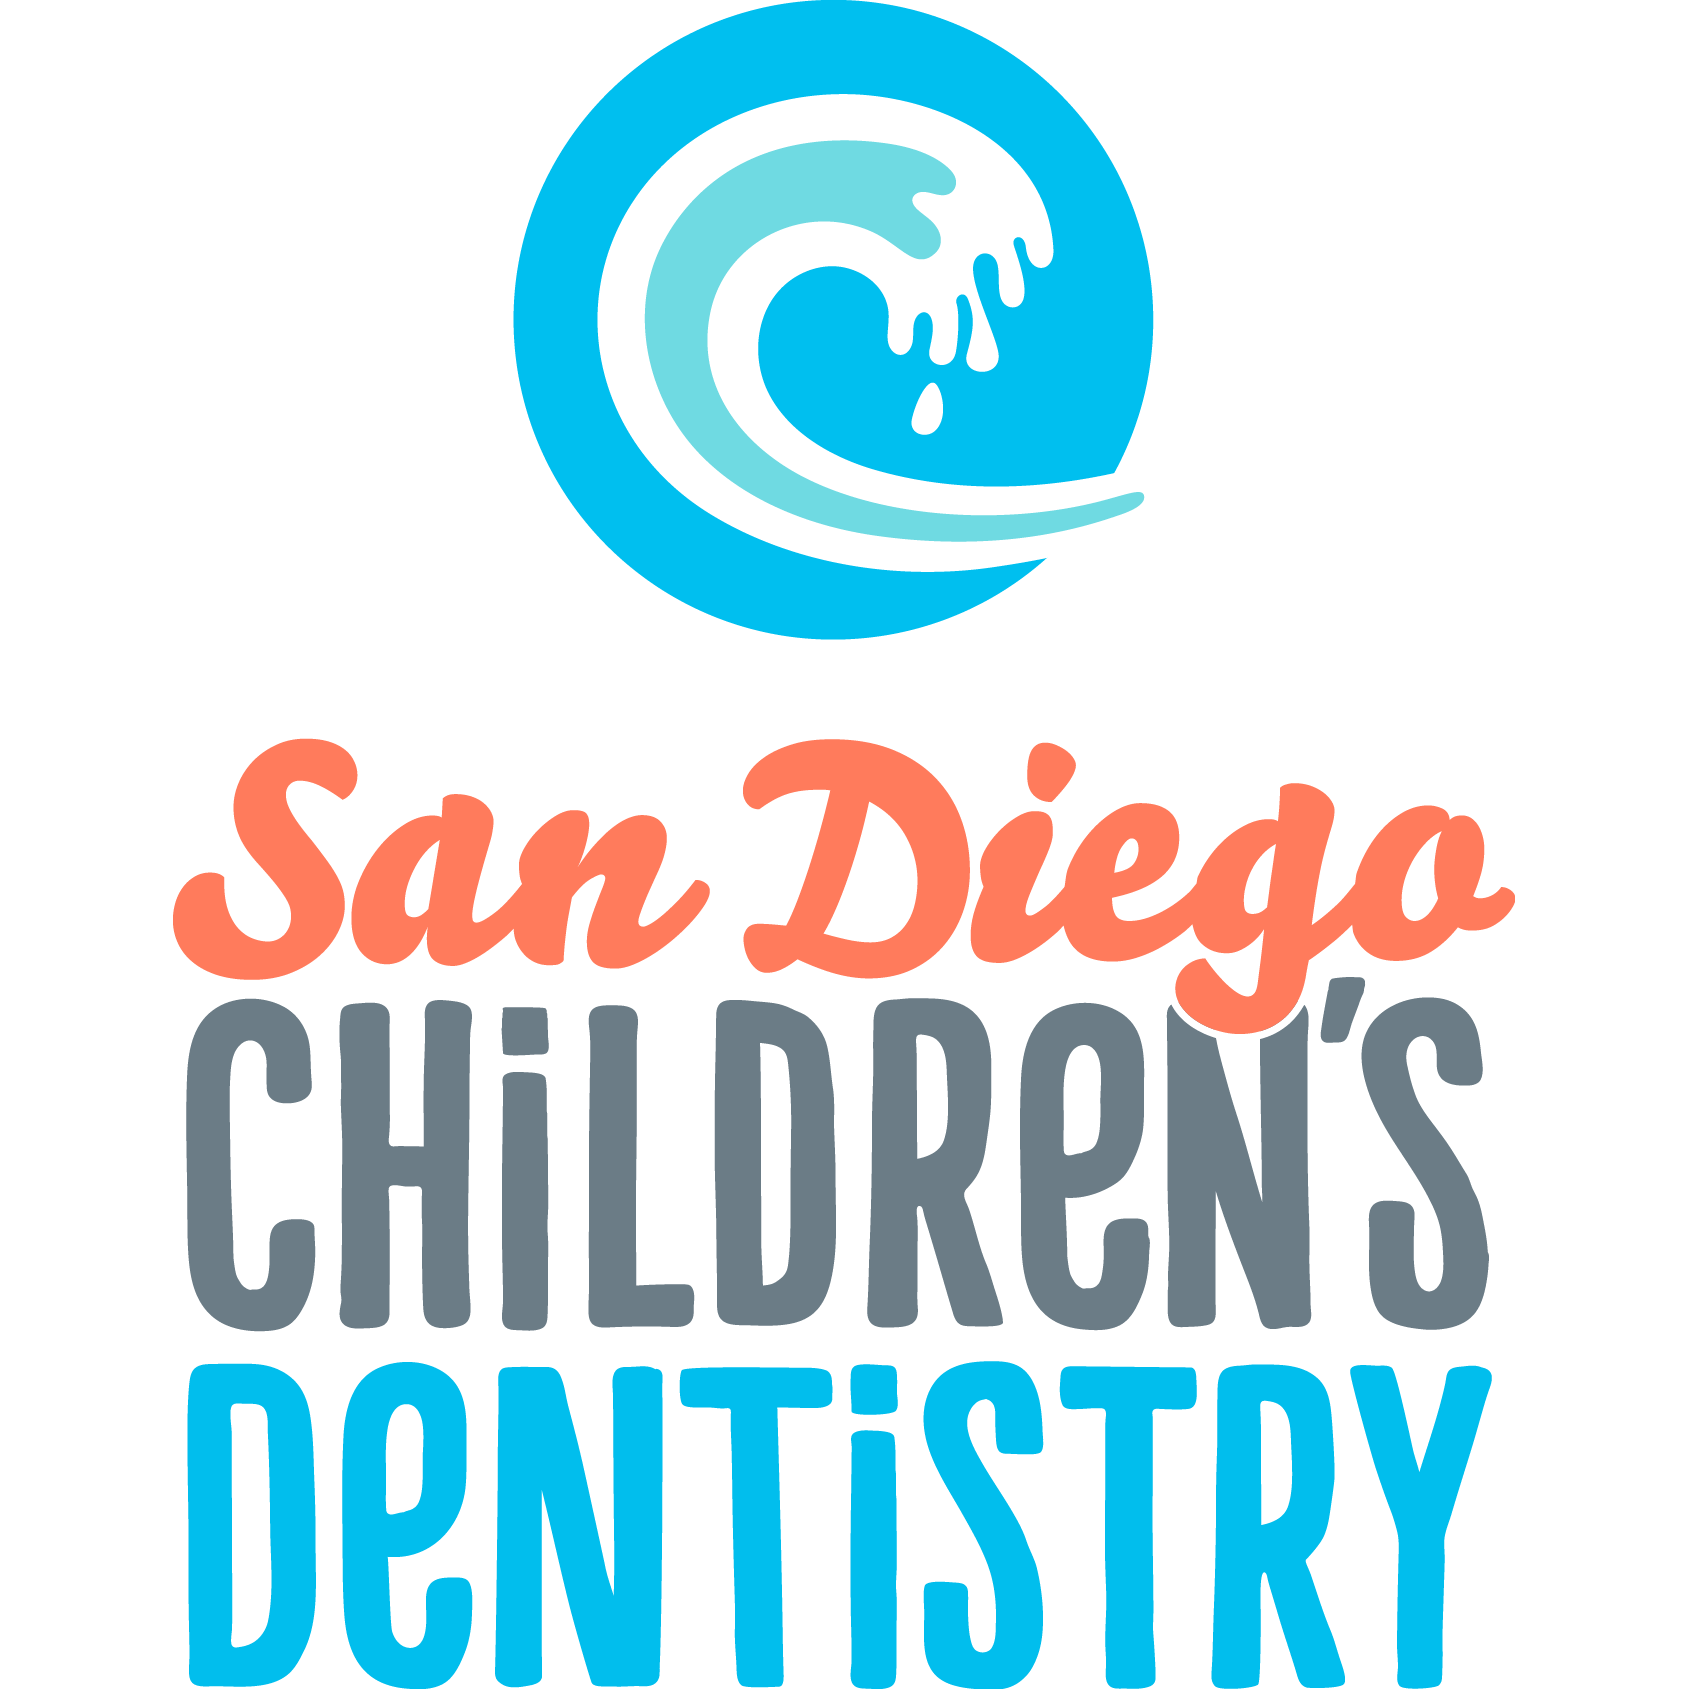 San Diego Children's Dentistry - Poway, CA - Dentists & Dental Services